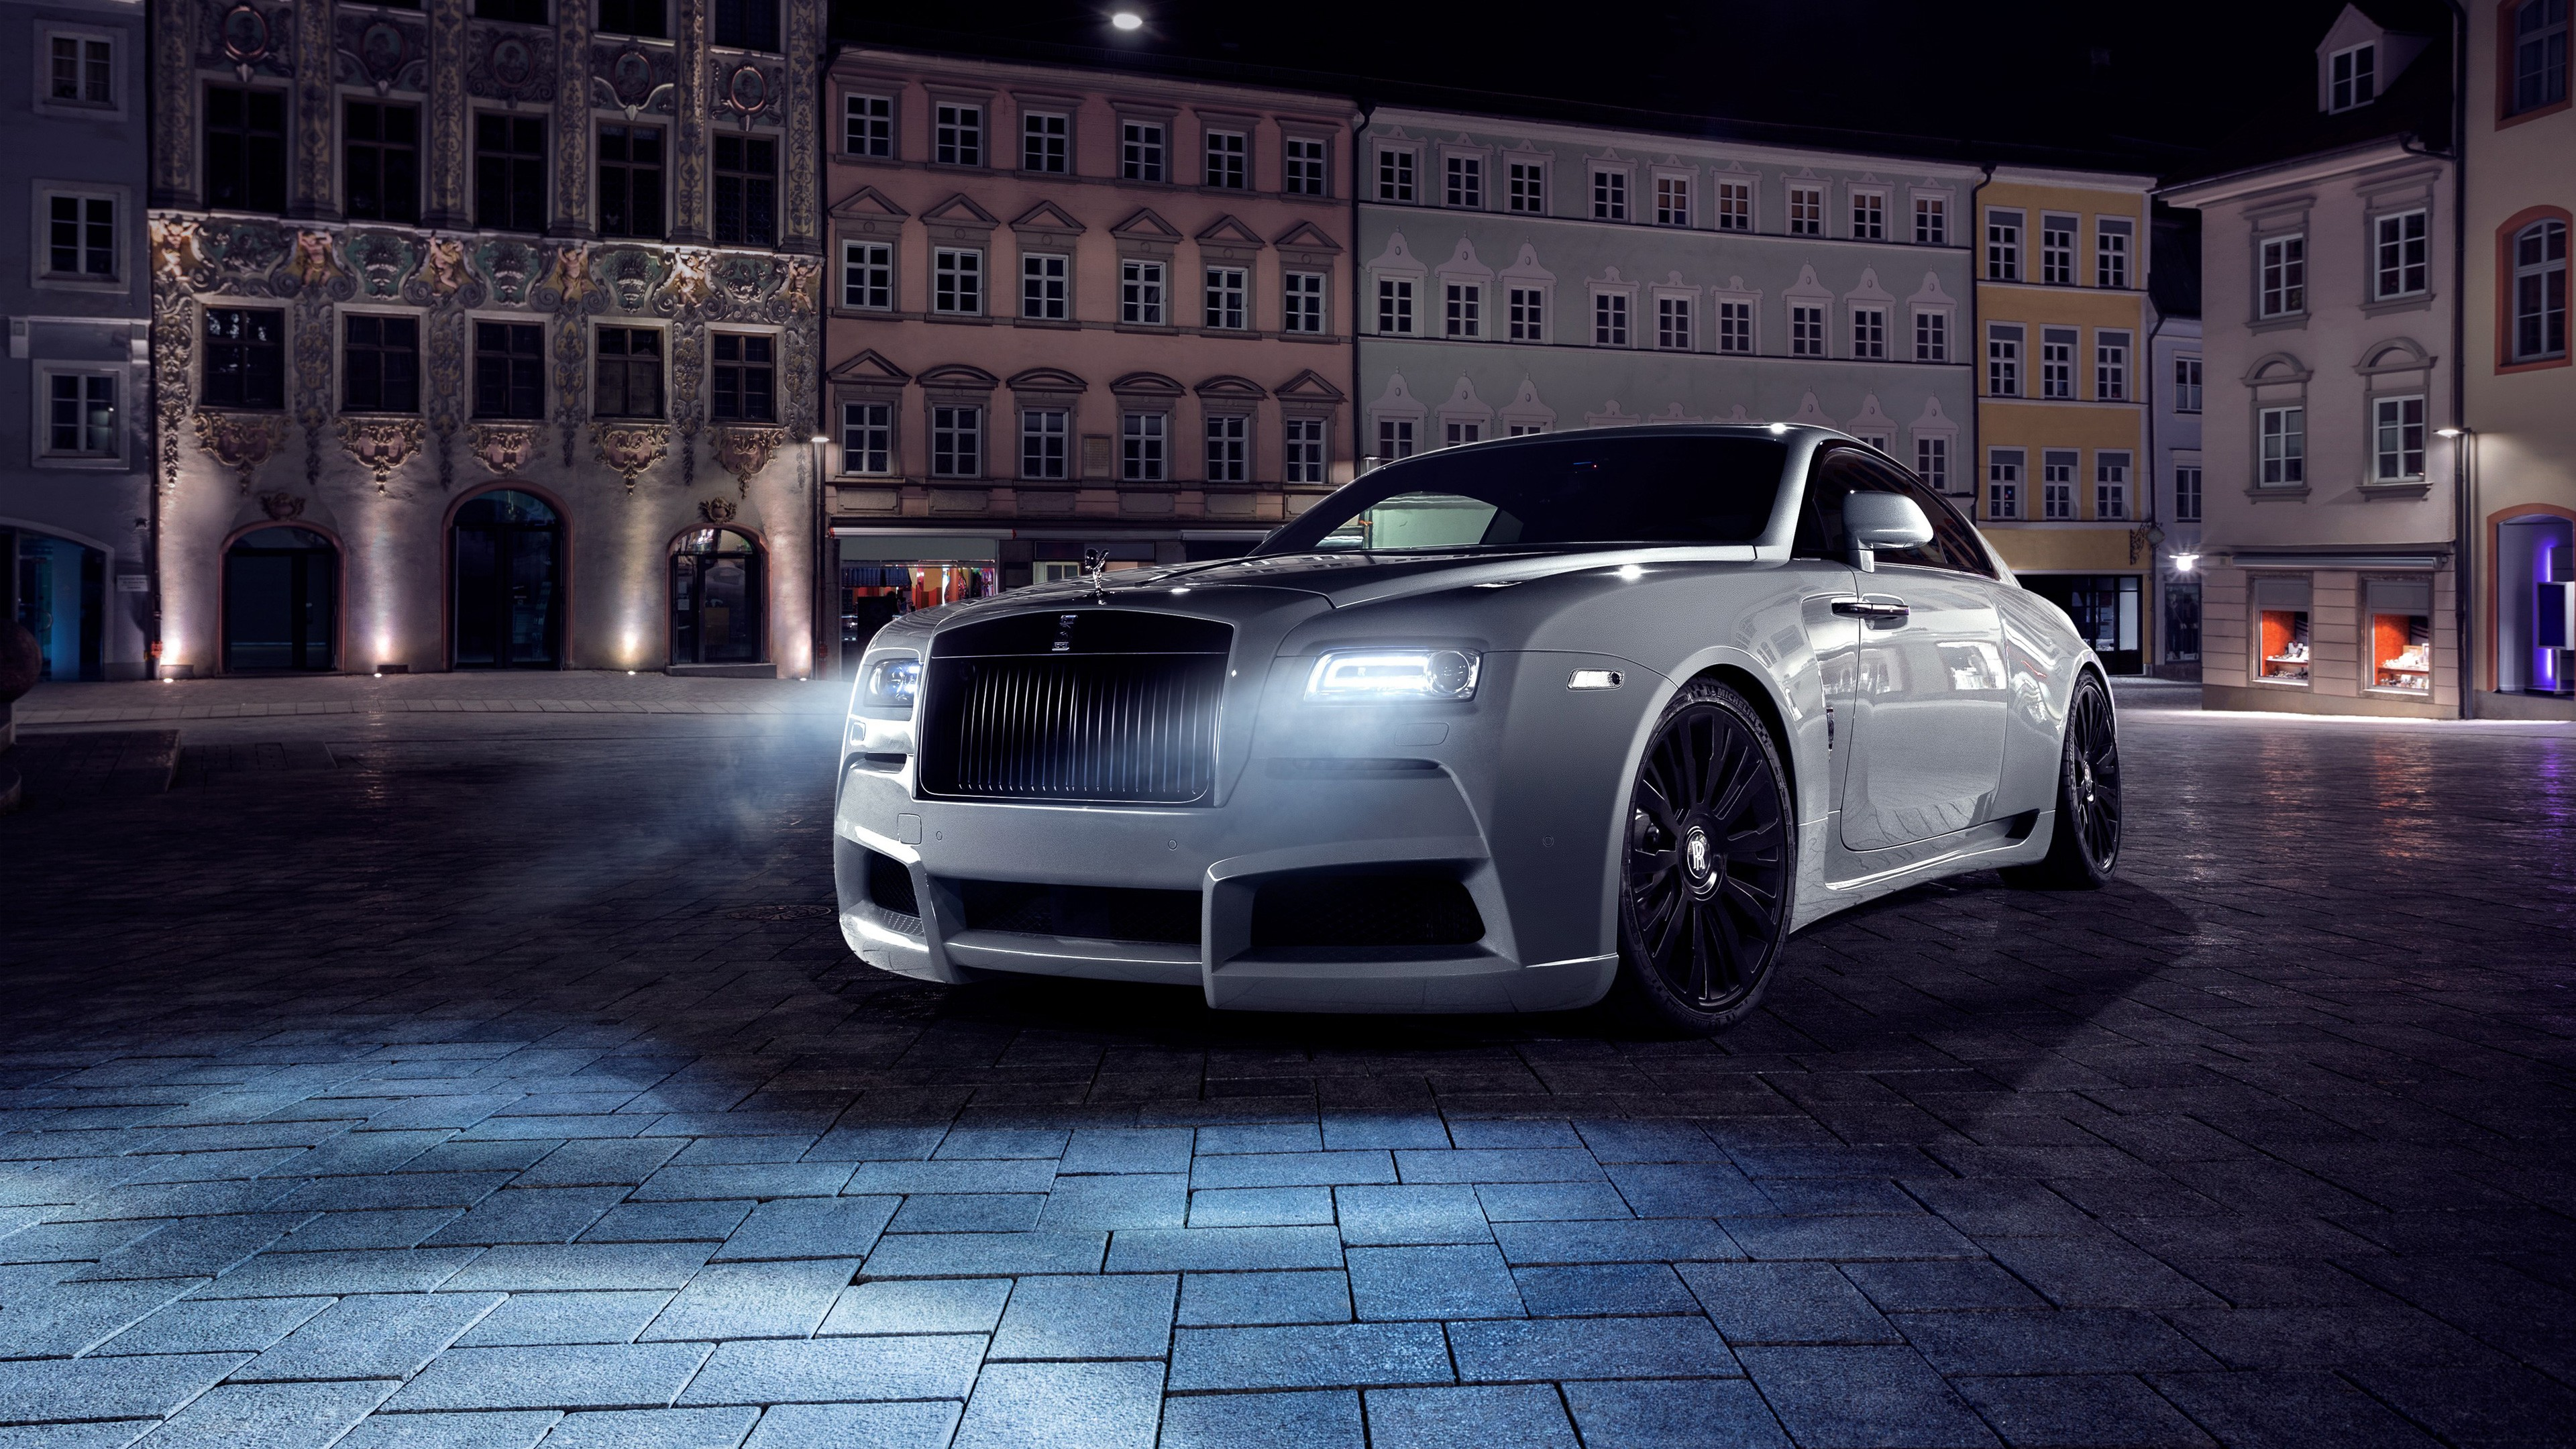 Spofec Rolls Royce Wraith Wallpaper | HD Car Wallpapers ...